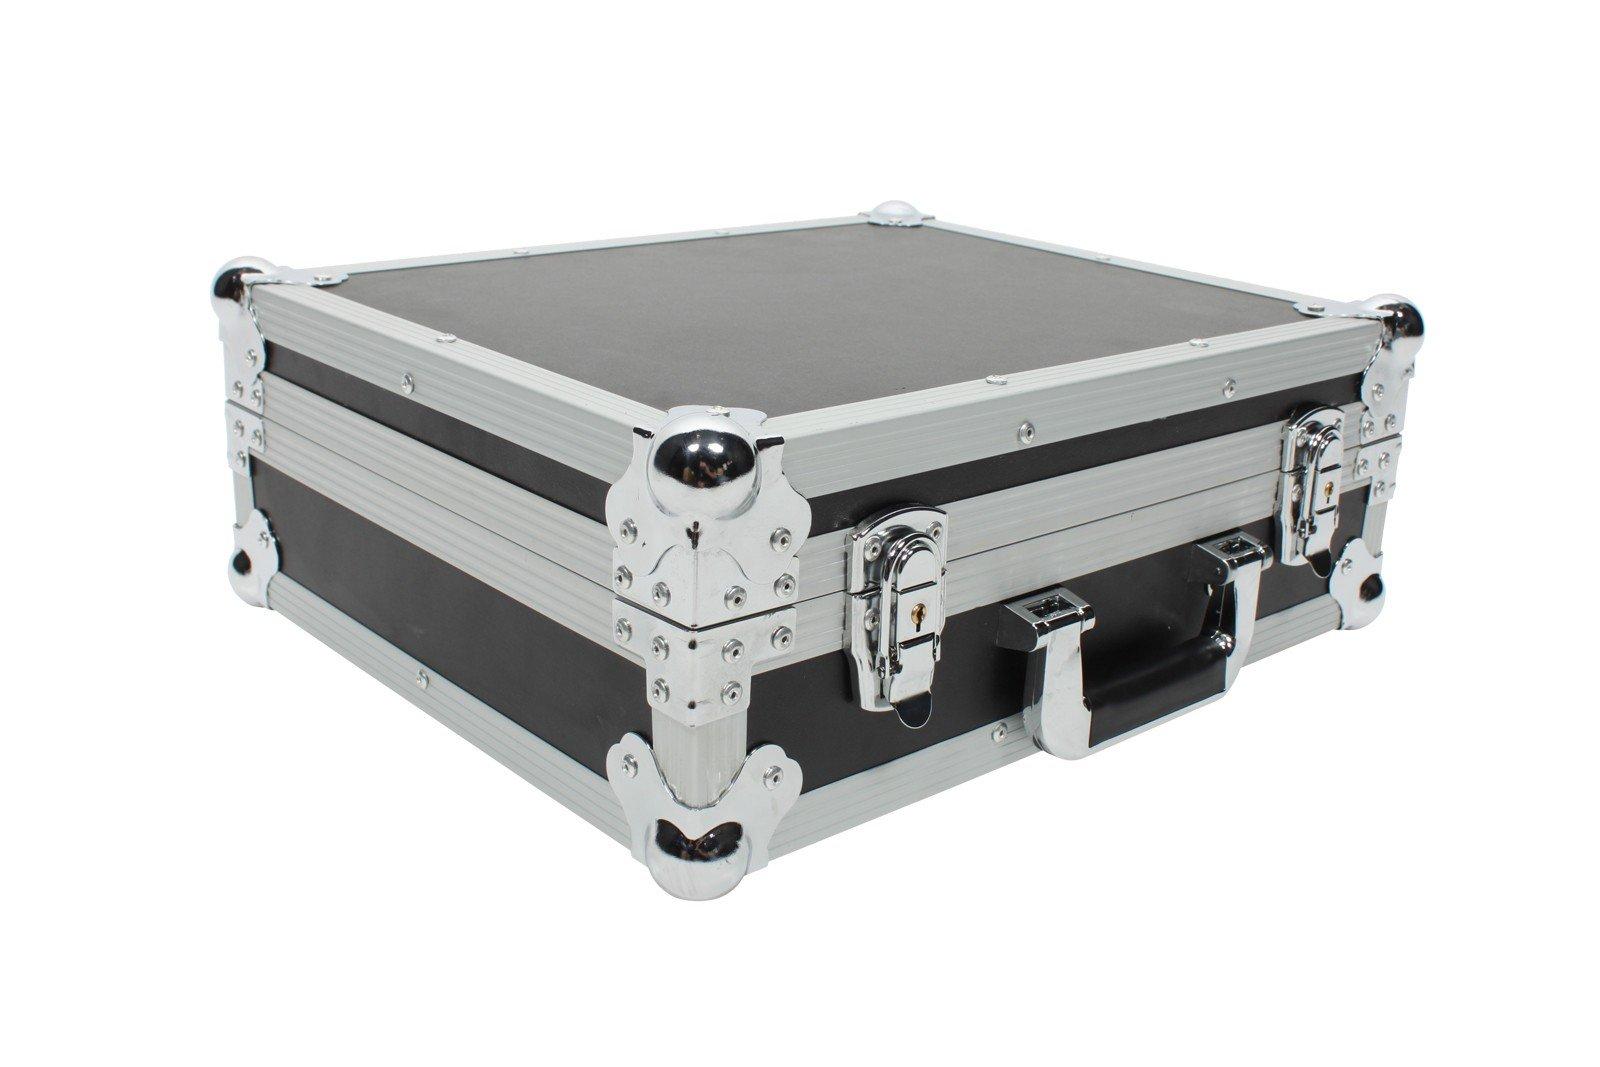 OSP Cases | ATA Road Case | Amplifier Case for Markbass Little Mark 800 Head | ATA-MARKB-LM800